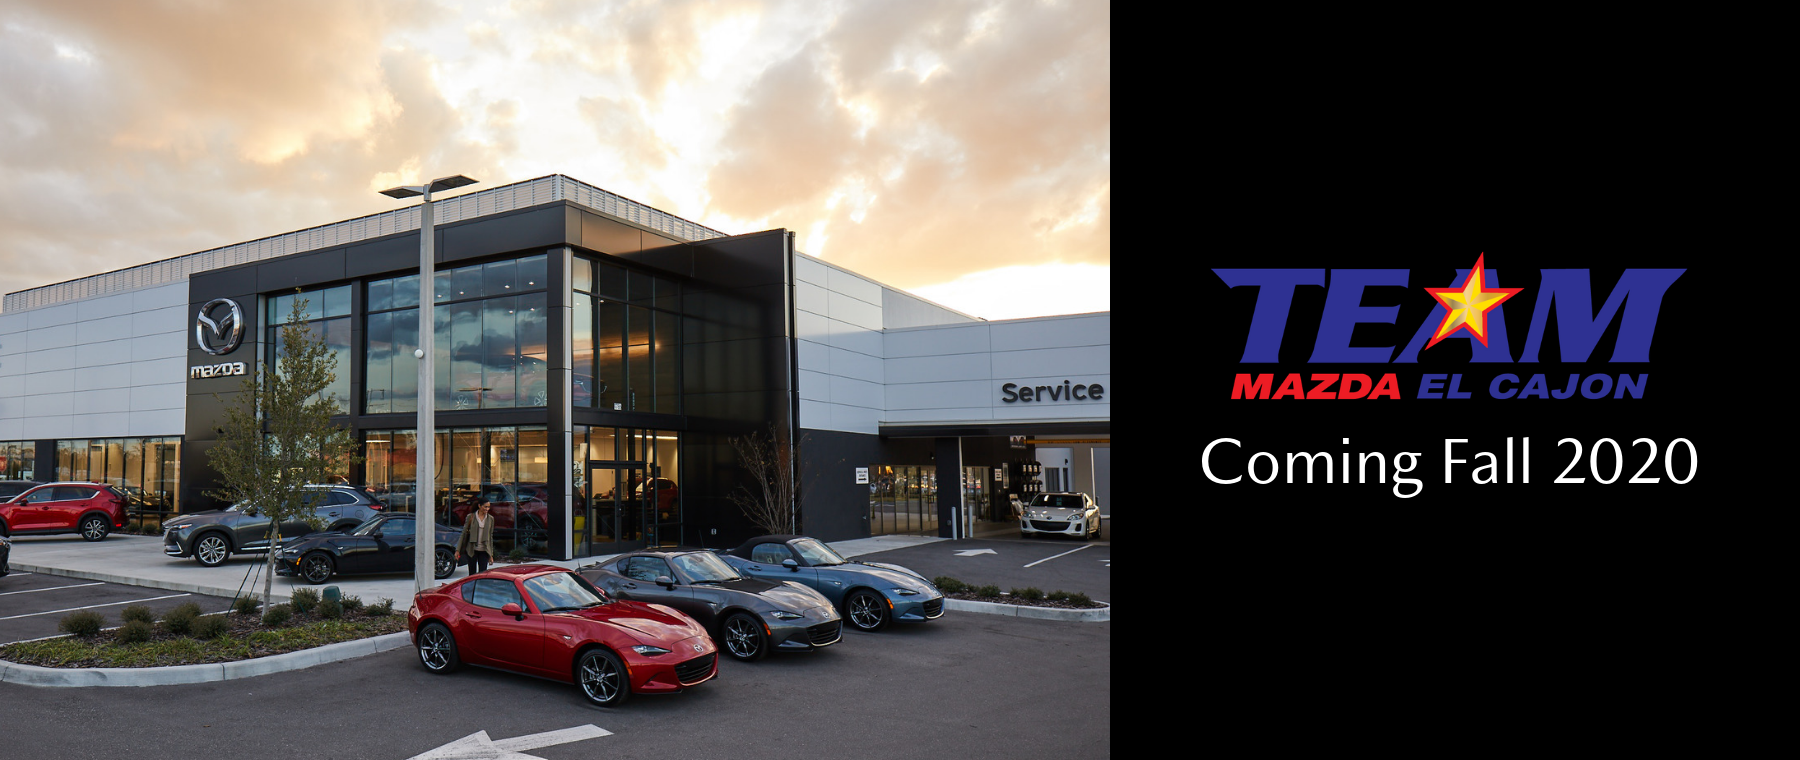 Mazda Dealership San Diego >> San Diego Mazda Dealer Mazda El Cajon Santee Chula Vista